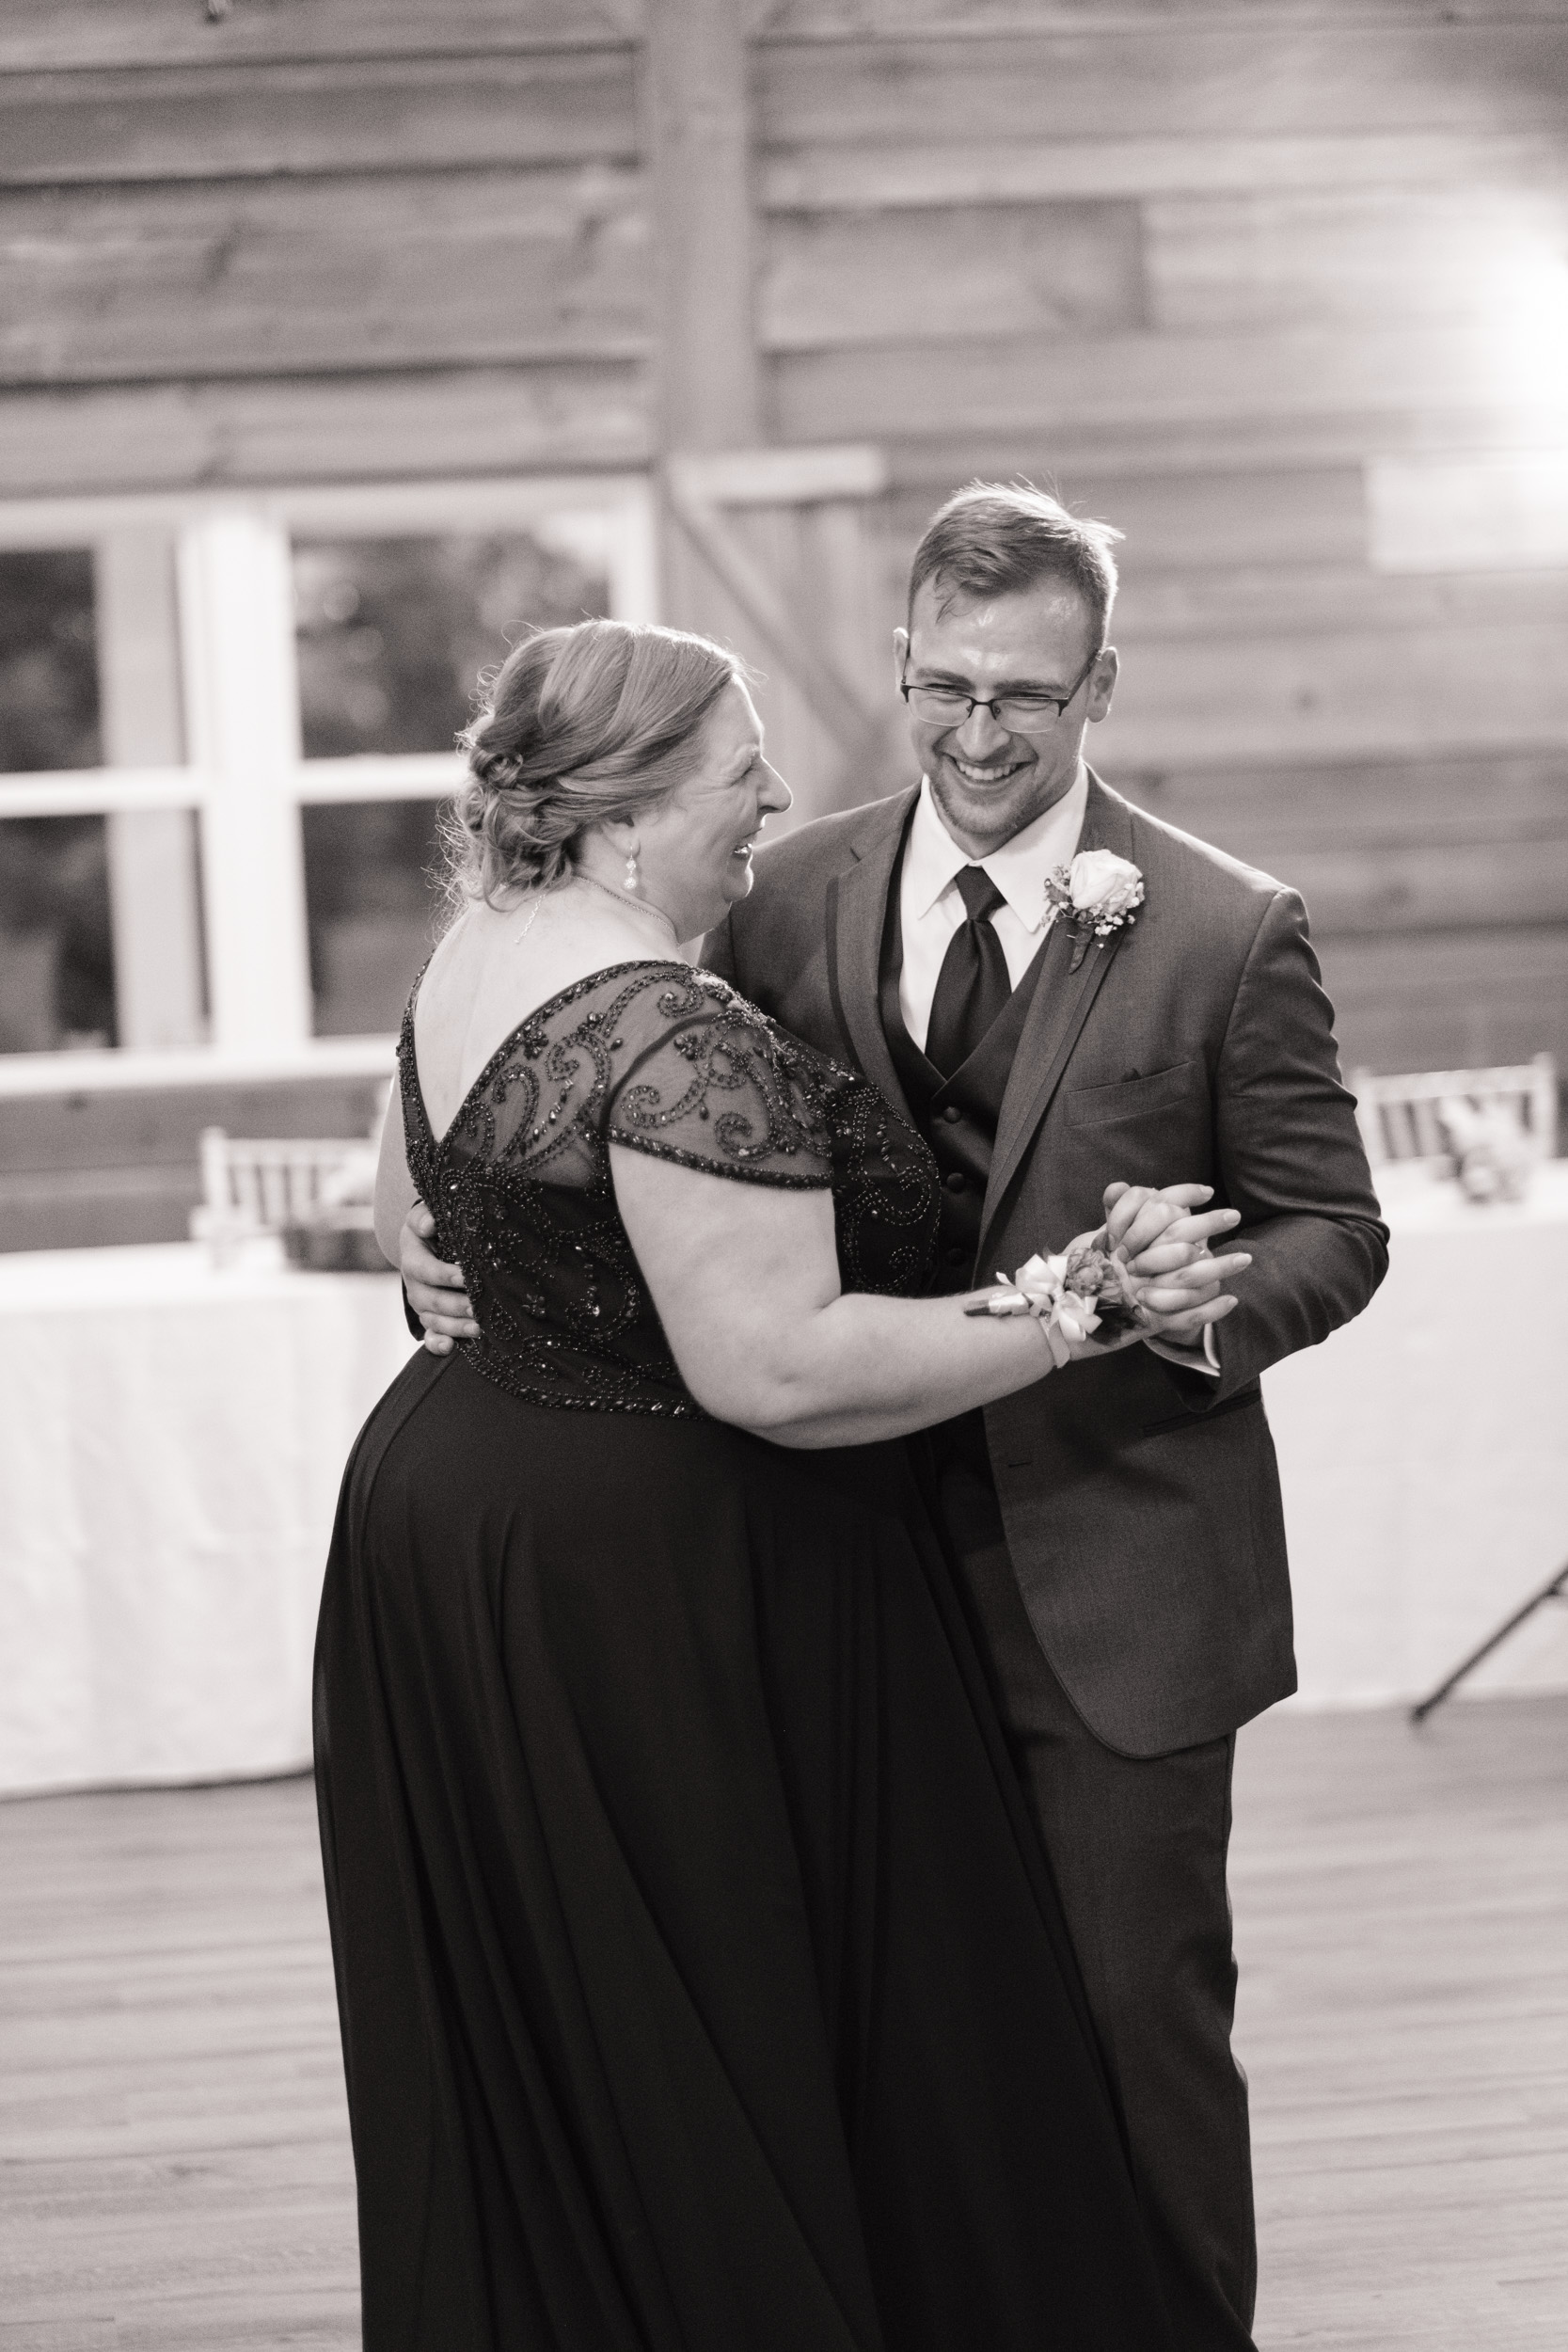 19-06-22-Ryan-Katie-The-Fields-Reserve-Wedding-81.jpg